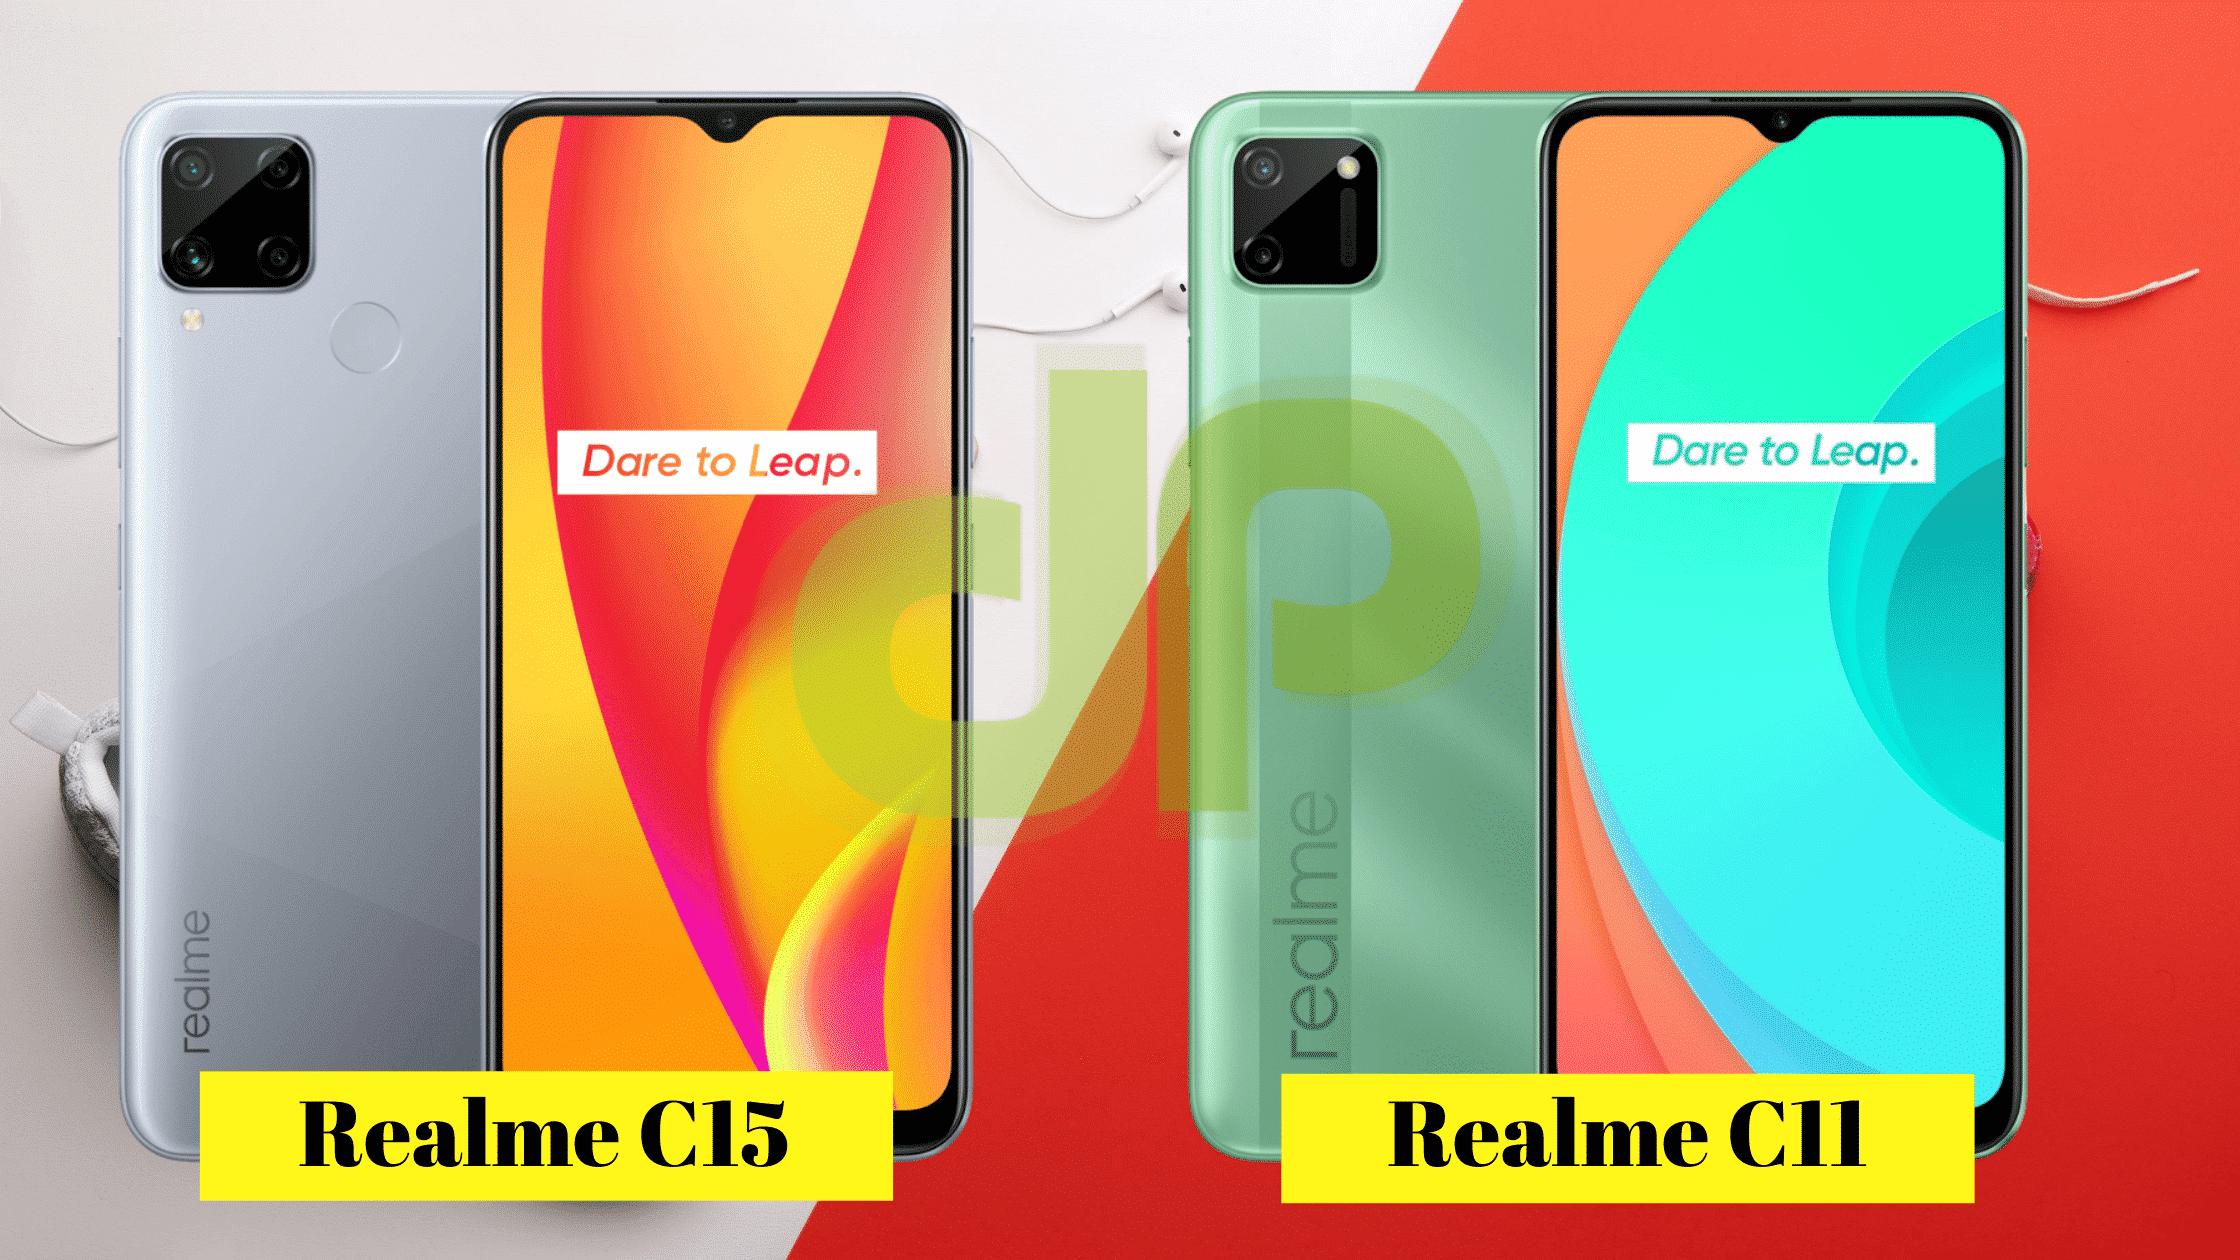 Realme C15 vs Realme C11